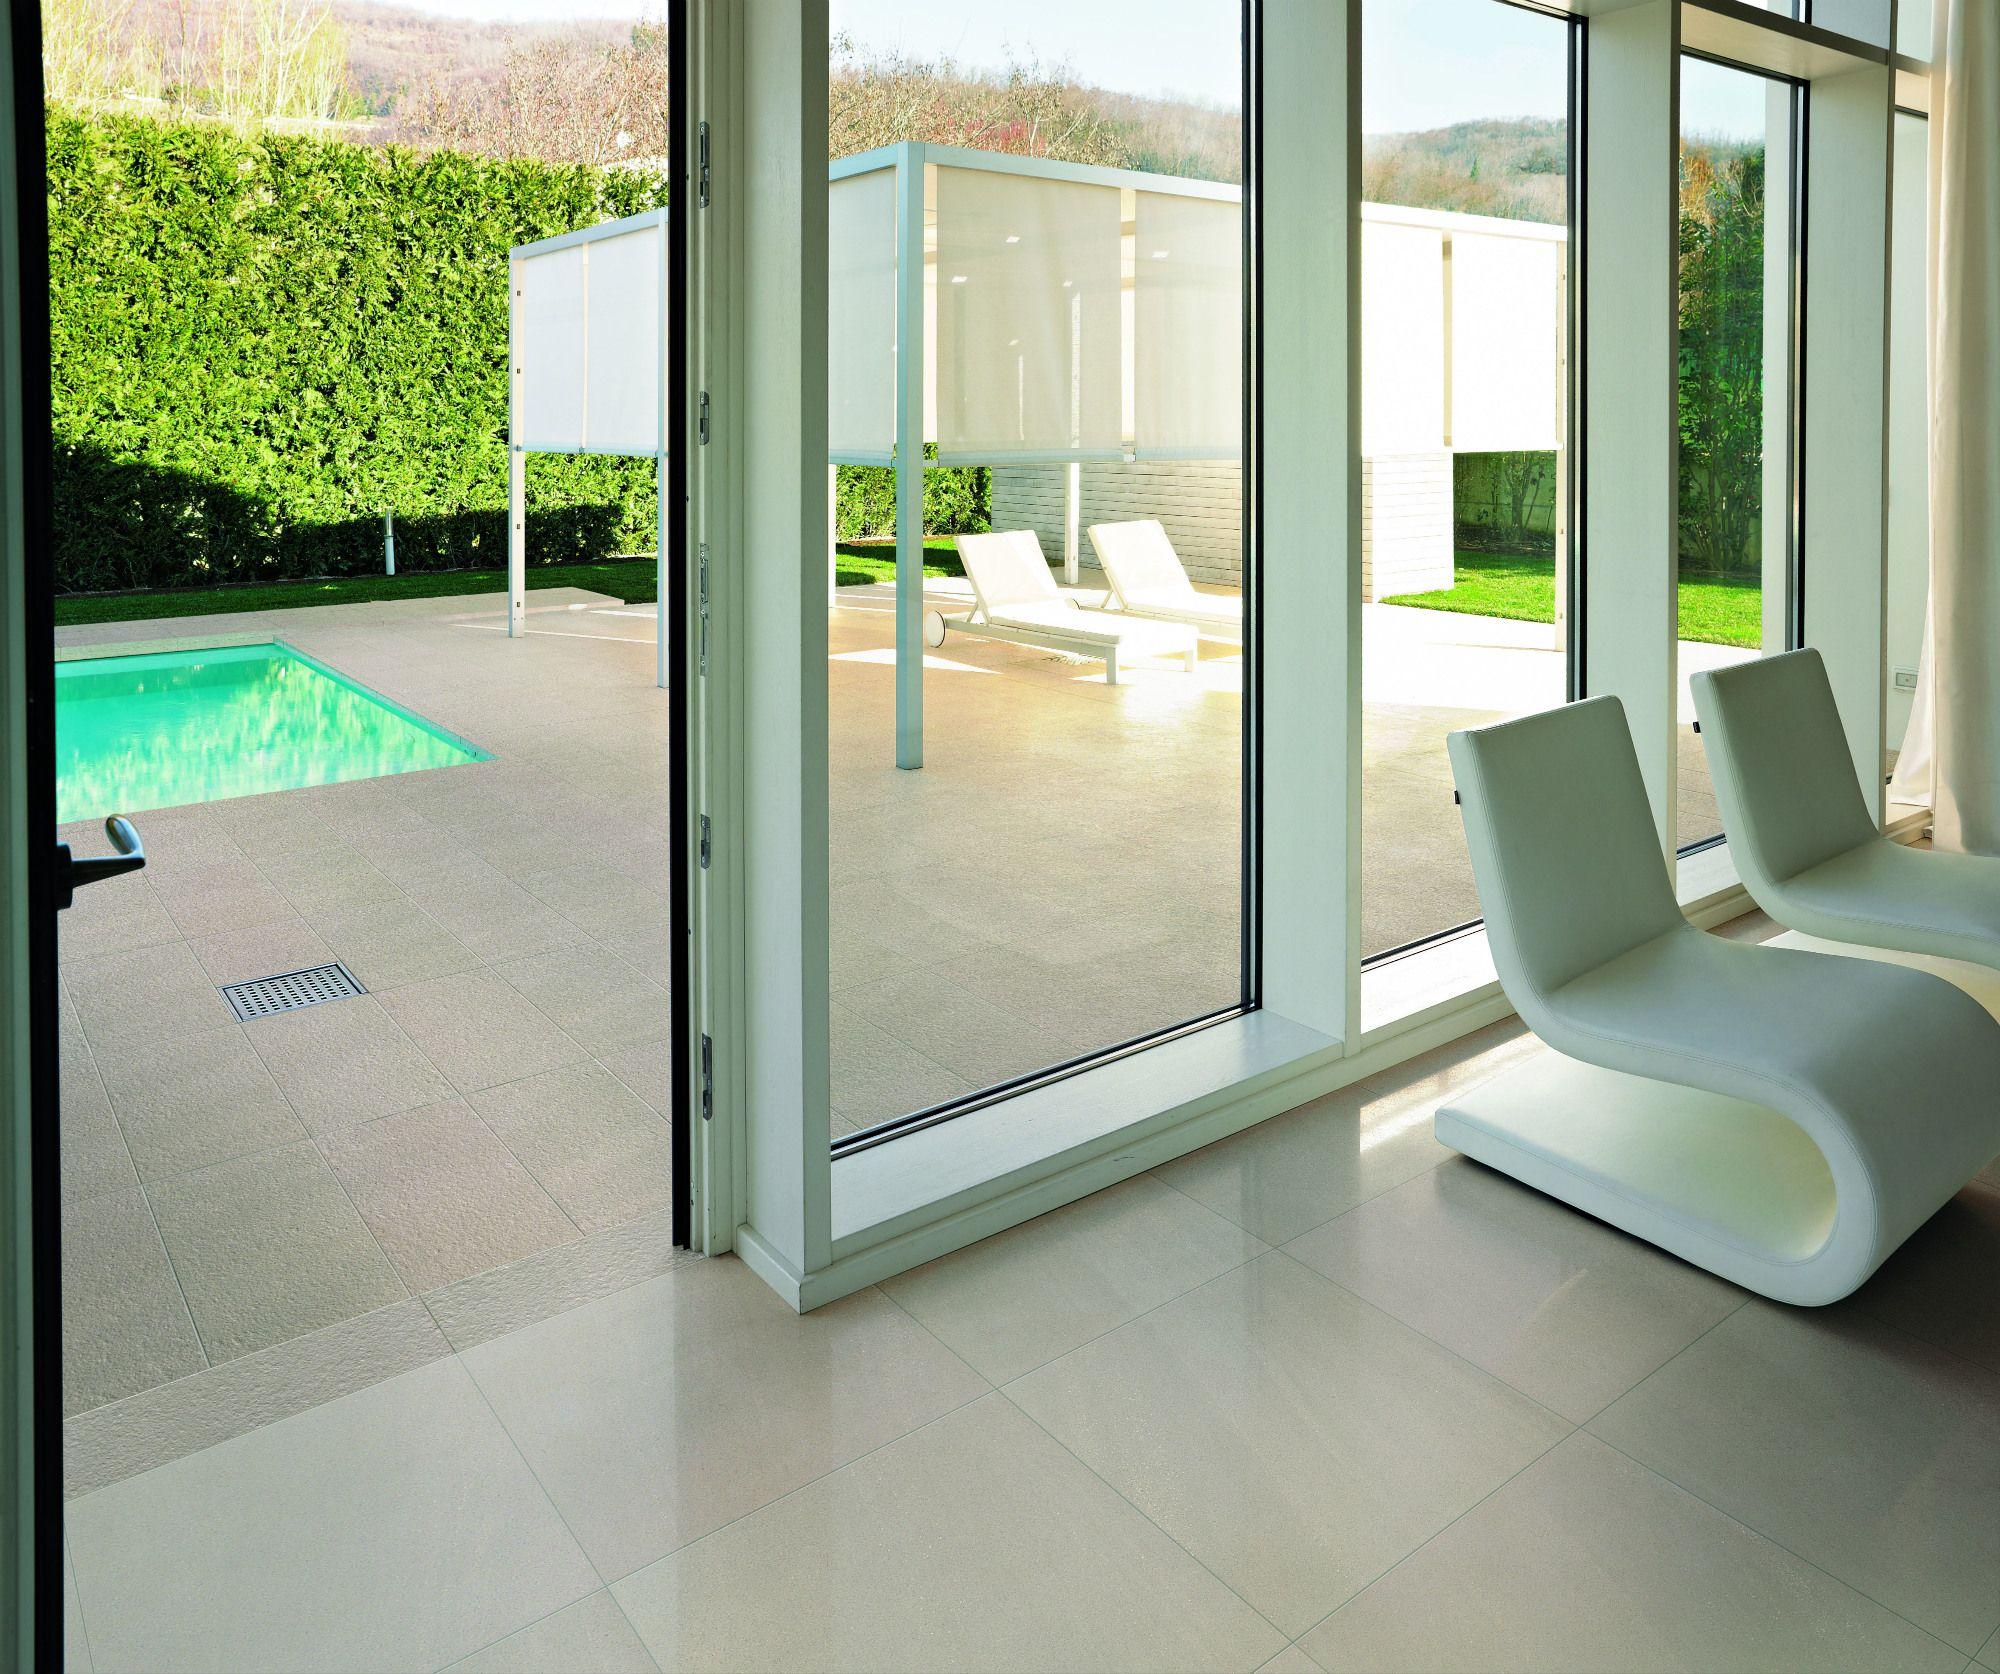 Minoli for ever outside floor tiles for ever rock strutturato outside floor tiles for ever rock strutturato 30 dailygadgetfo Choice Image